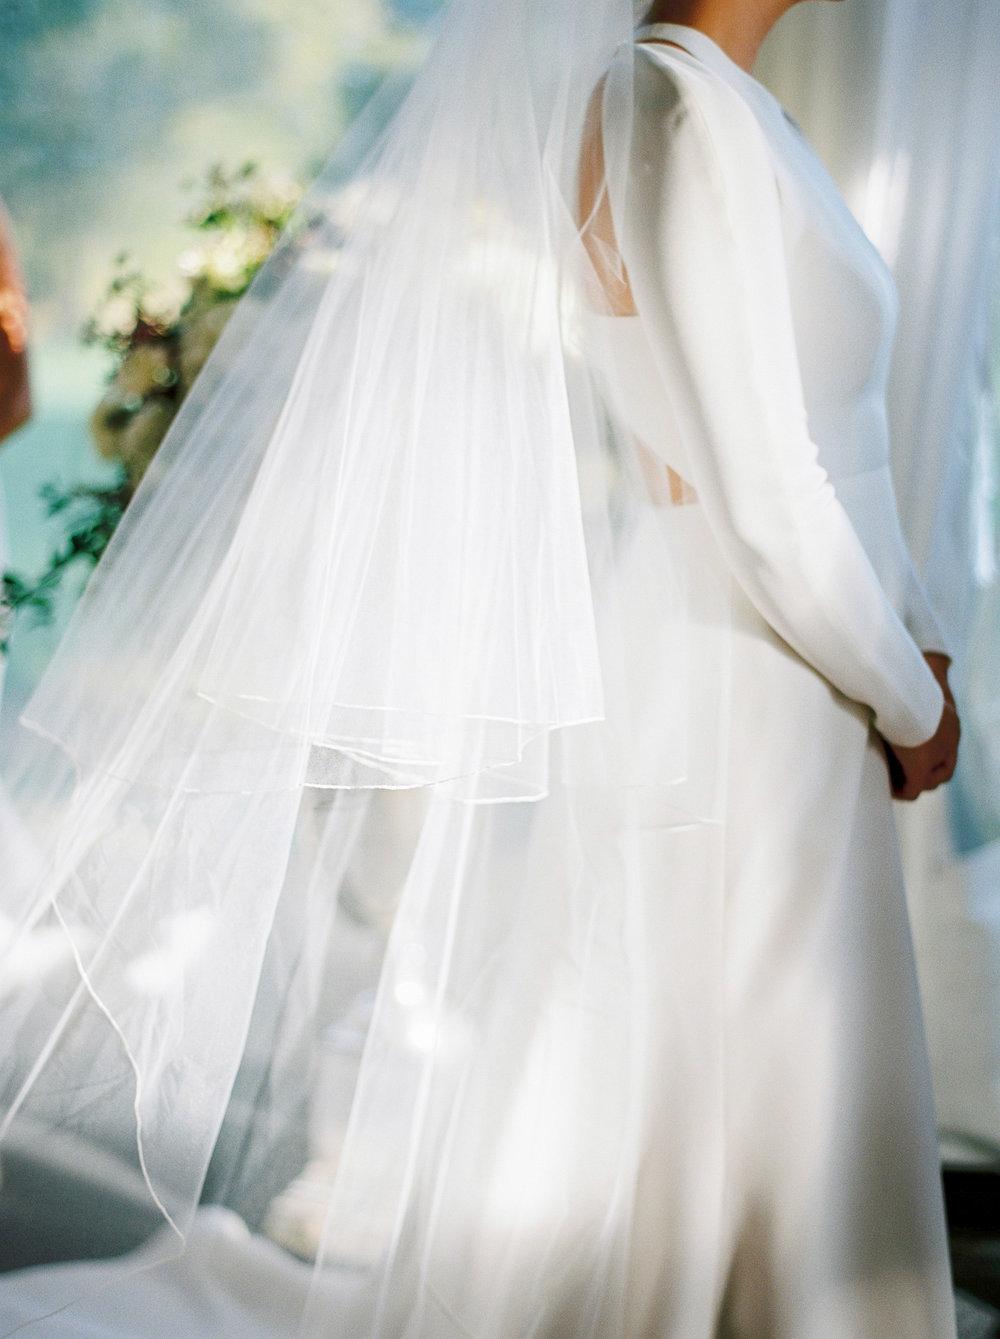 0477-Geneva-Ian-Wedding-Toronto Golf Club-When He Found Her-TorontoPhotographer.jpg